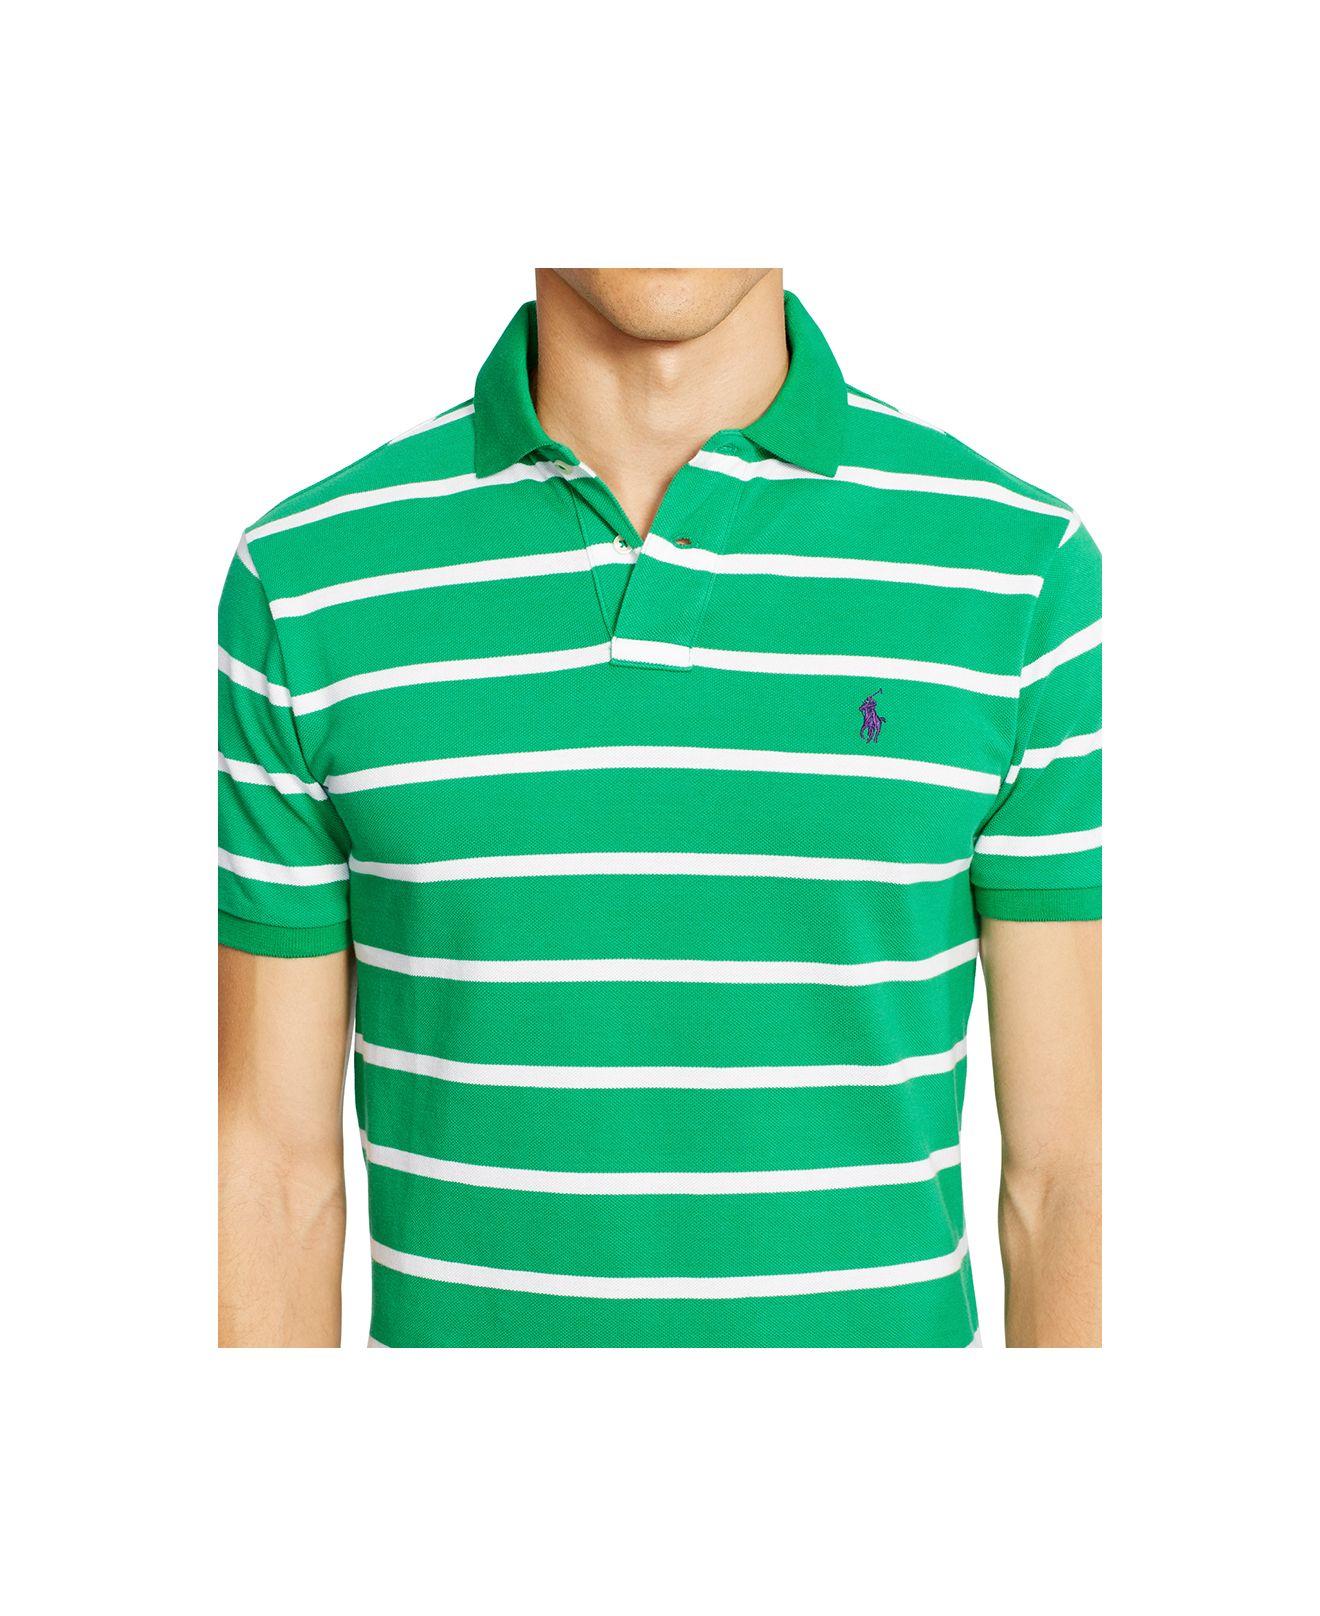 b58a87098 ... amazon lyst polo ralph lauren mens classic fit striped mesh polo shirt  11a04 e36bf